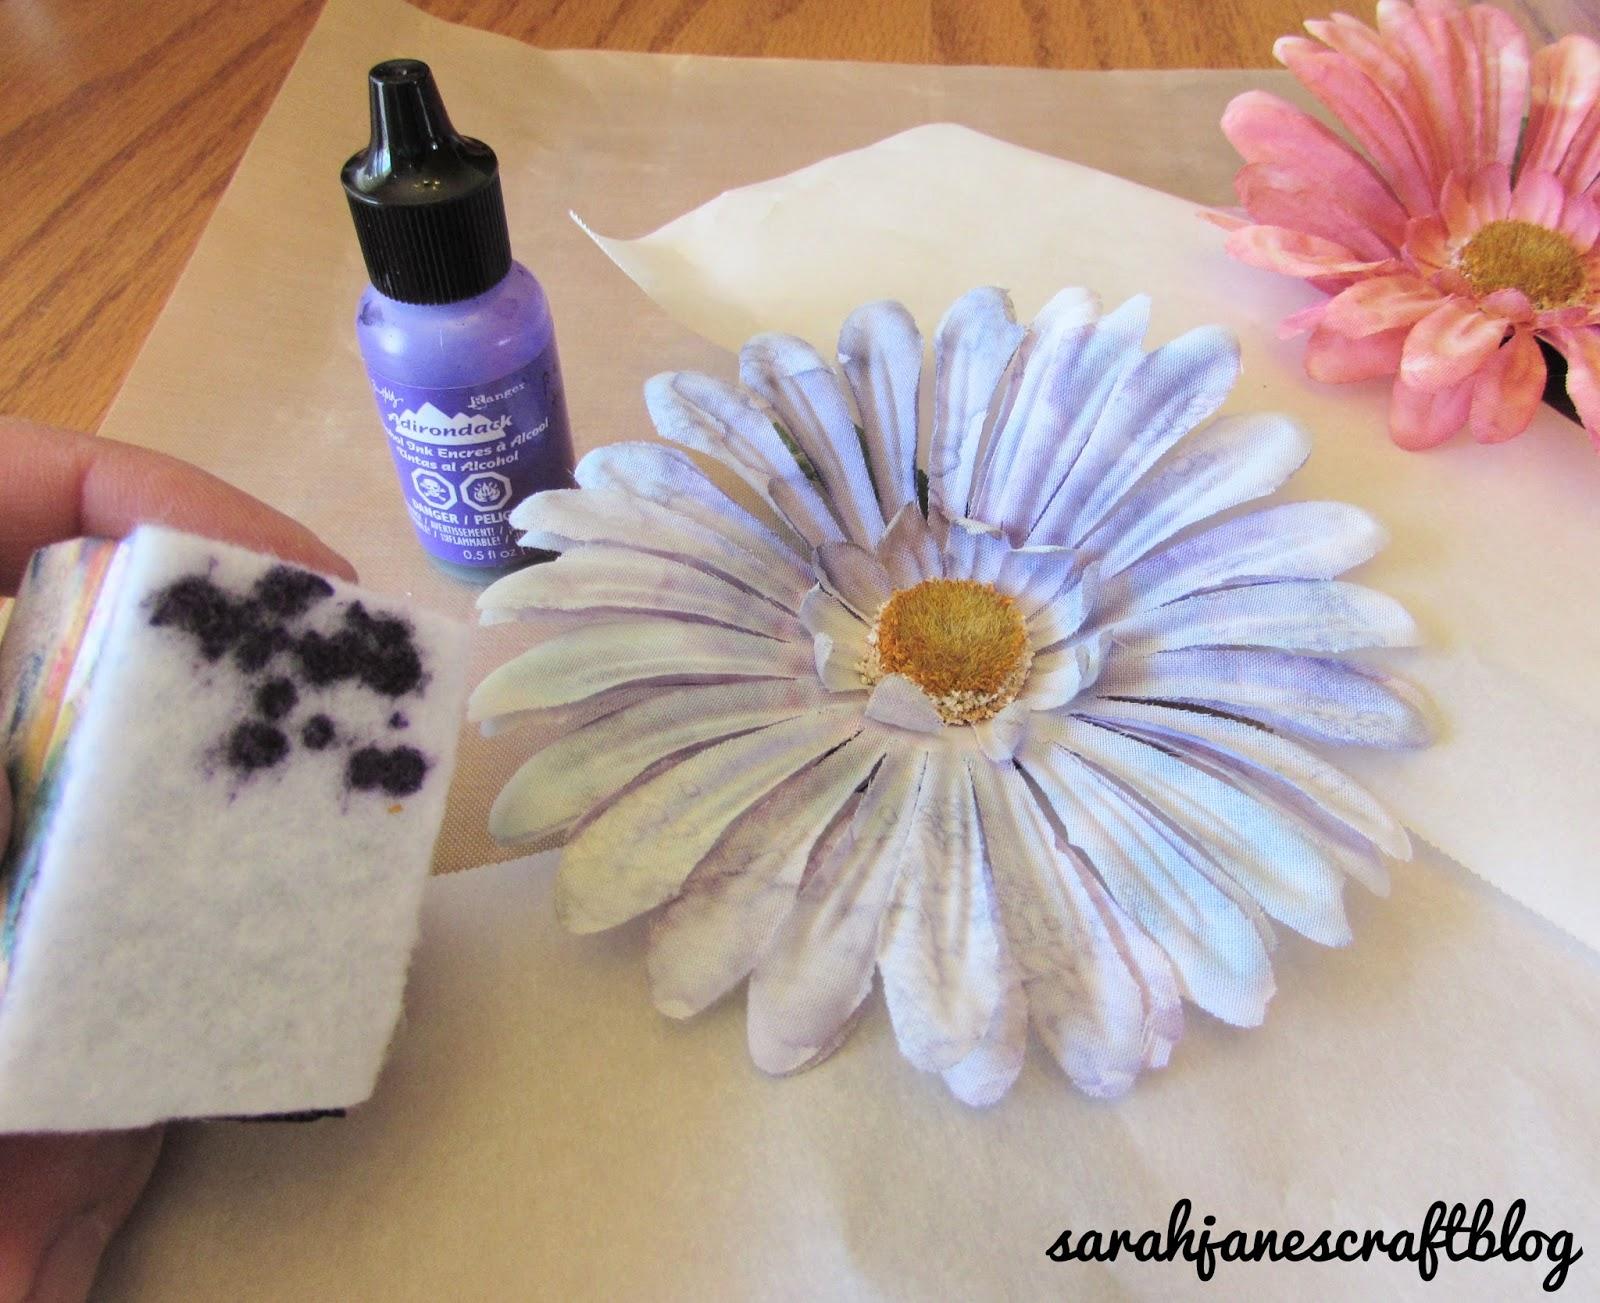 Sarah Janes Craft Blog Alcohol Ink Dyed Silk Flowers Refresh